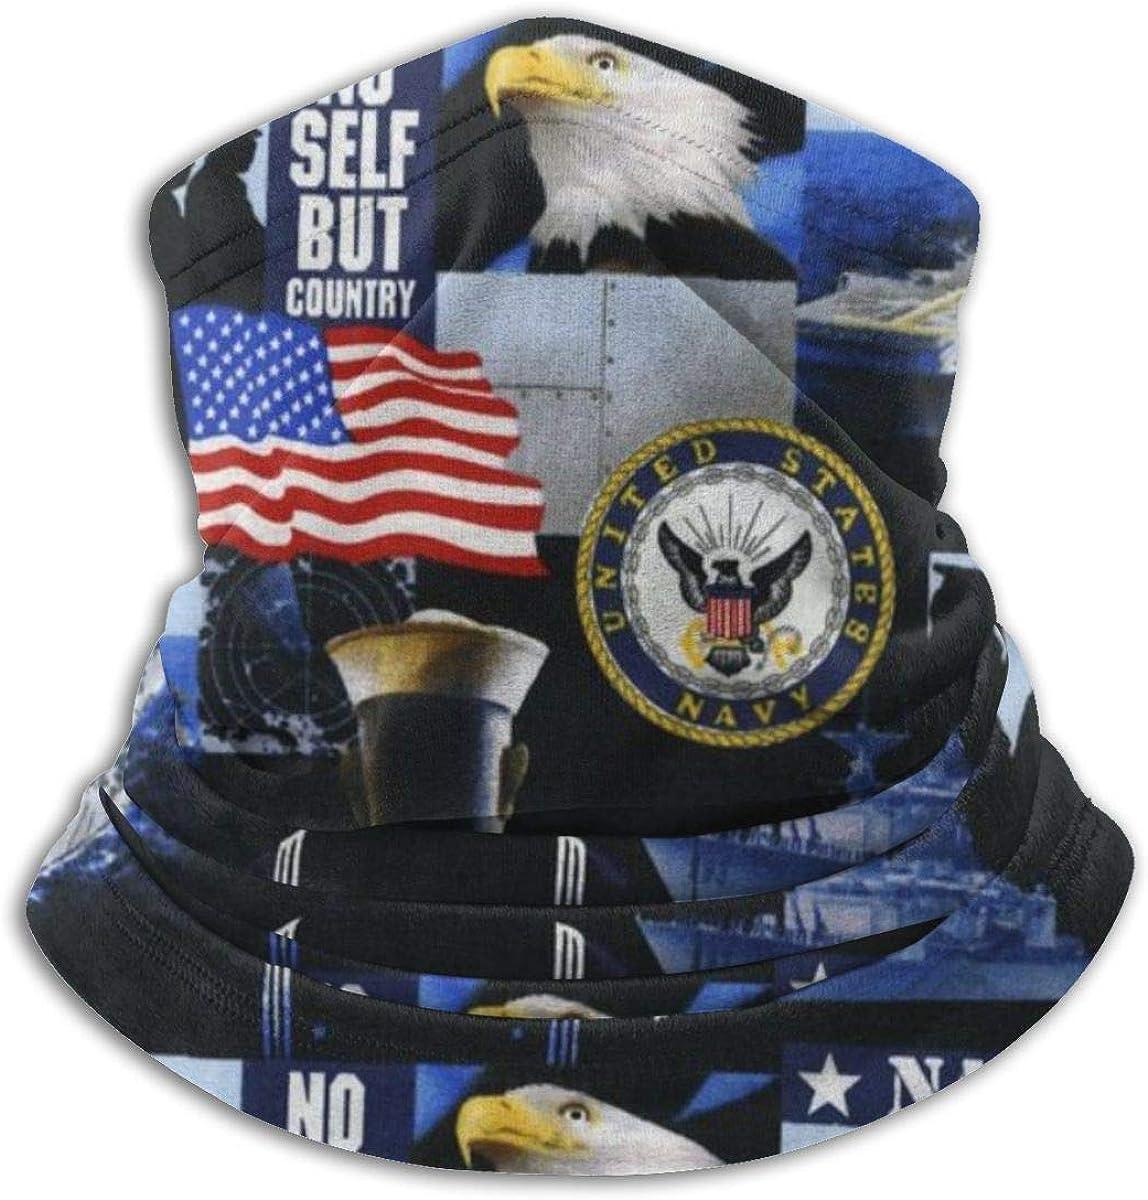 Bufanda Fleece Neck Warmer US Navy Eagle USA Flag No Self But Country Windproof Winter Ski Mascarilla Pasamontañas Media máscara Gaiter Warmer